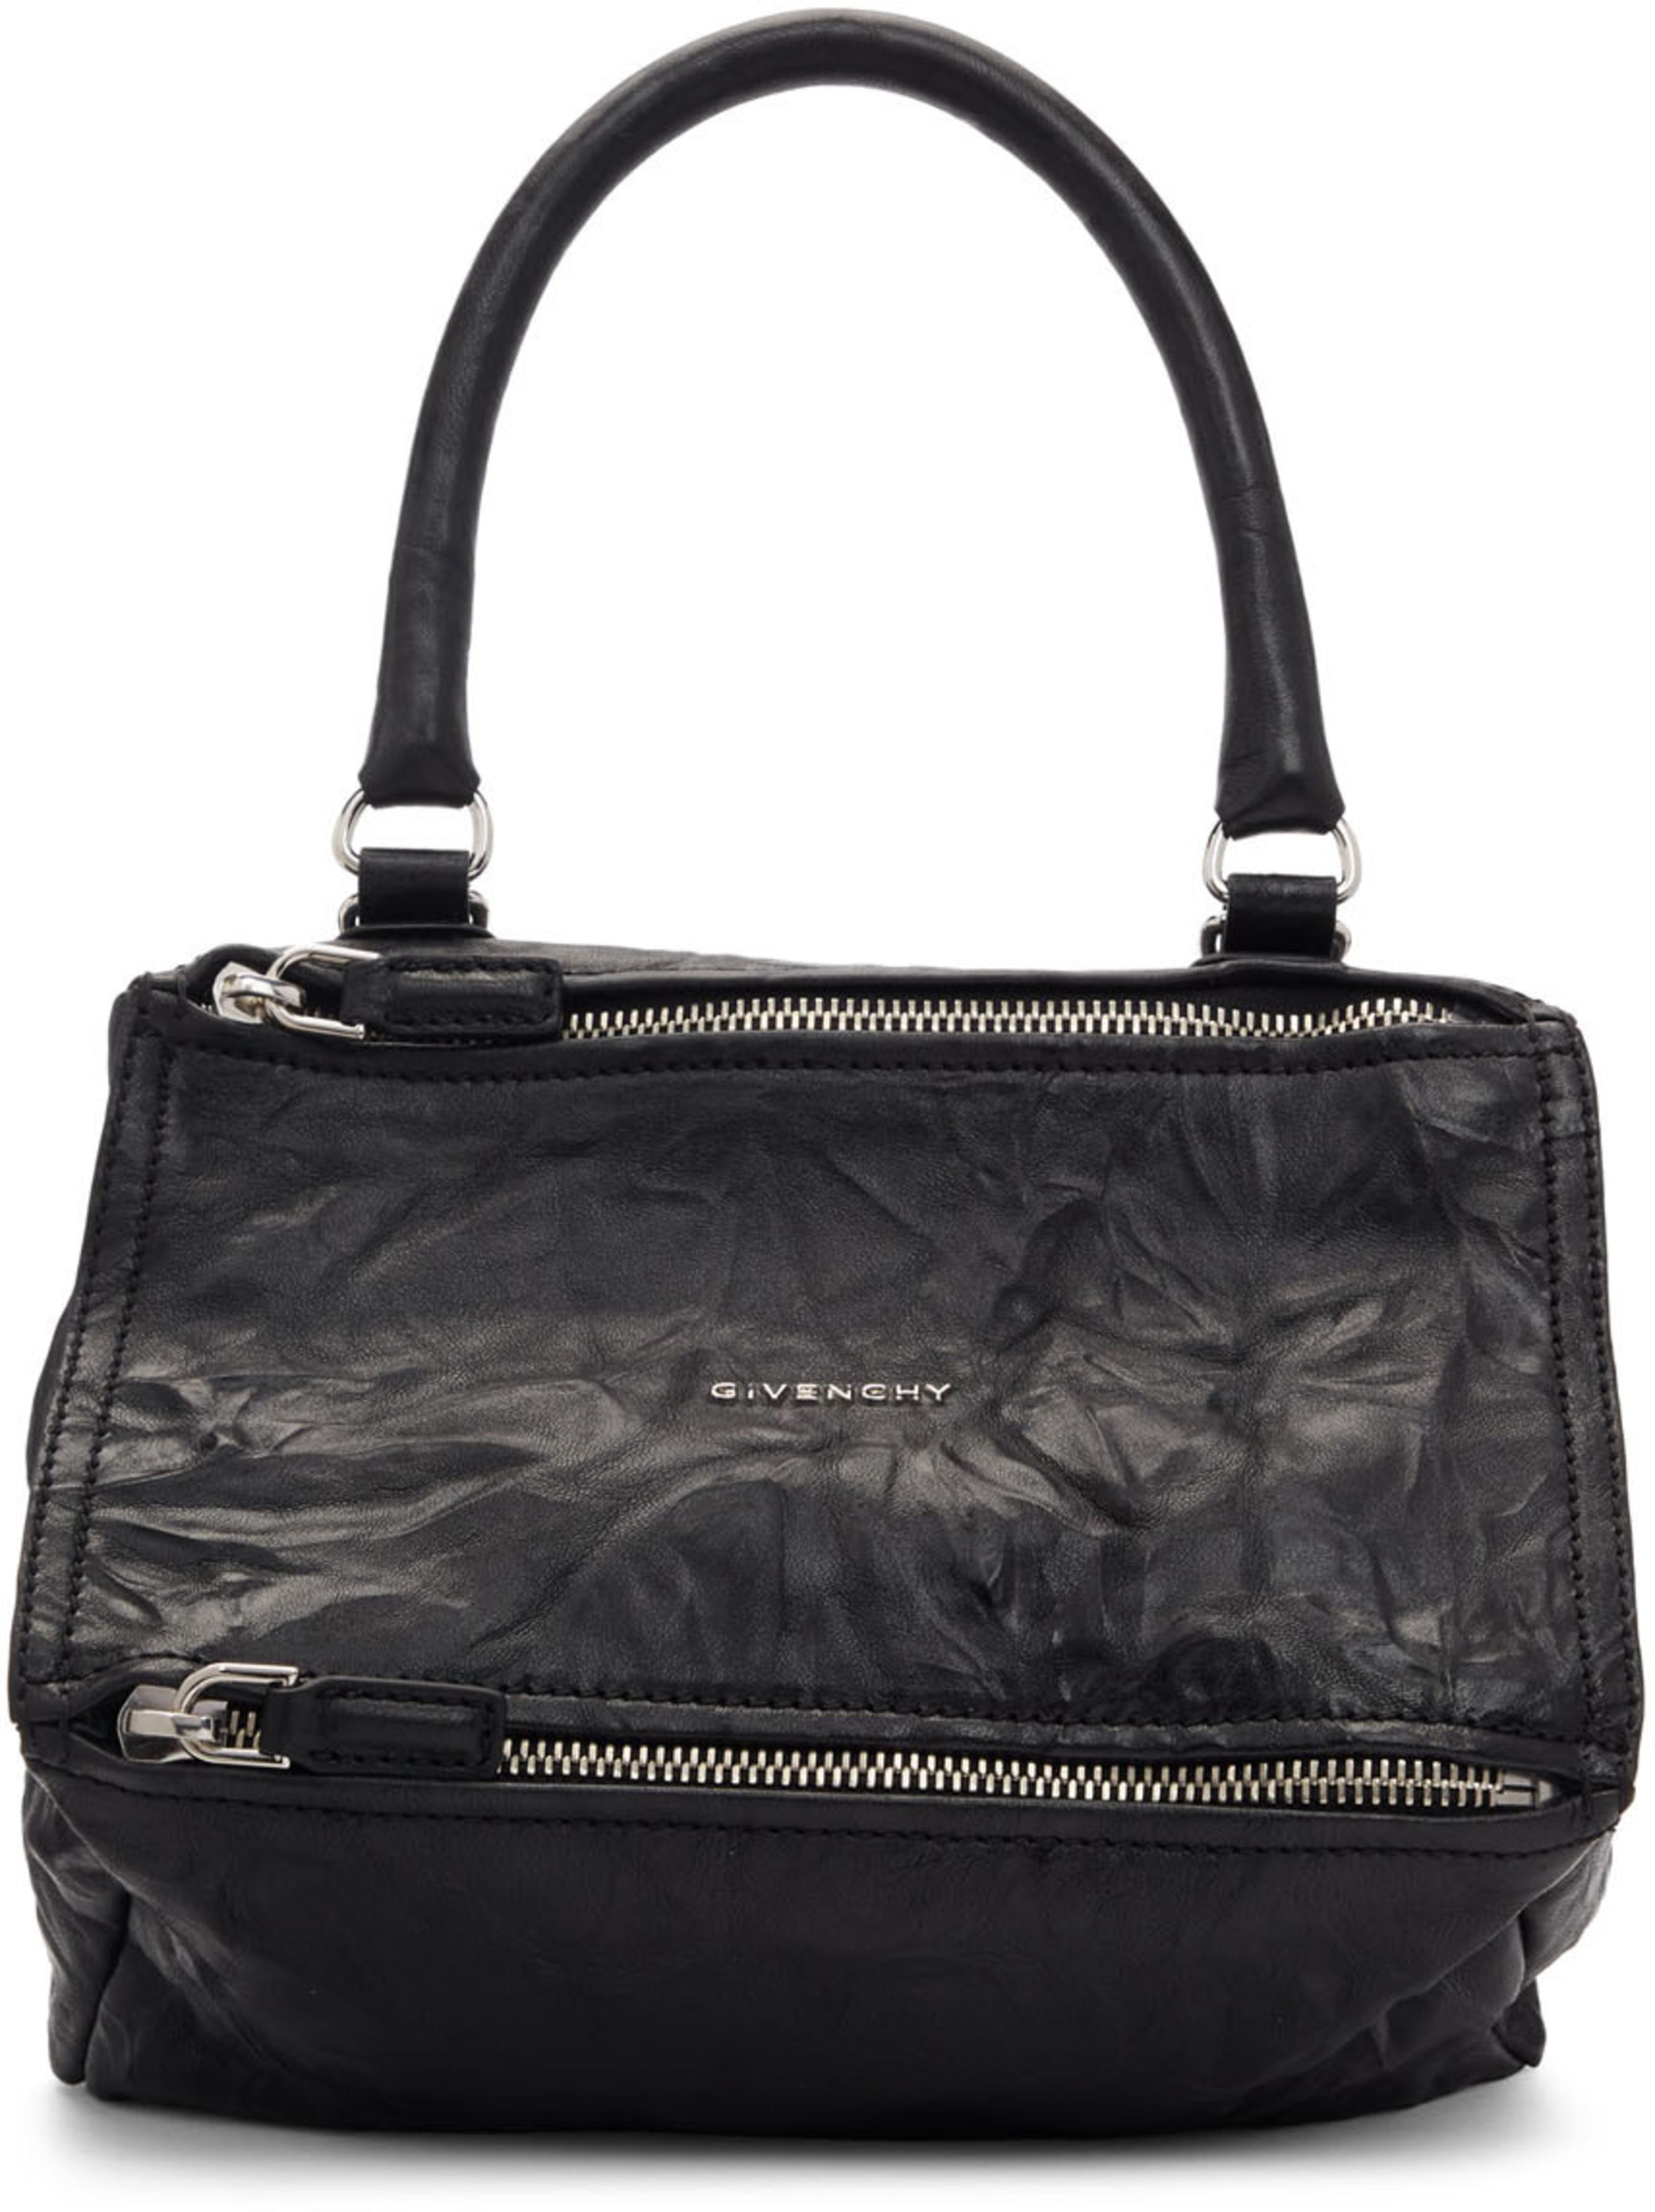 Givenchy bags for Women  c80e2e601d759